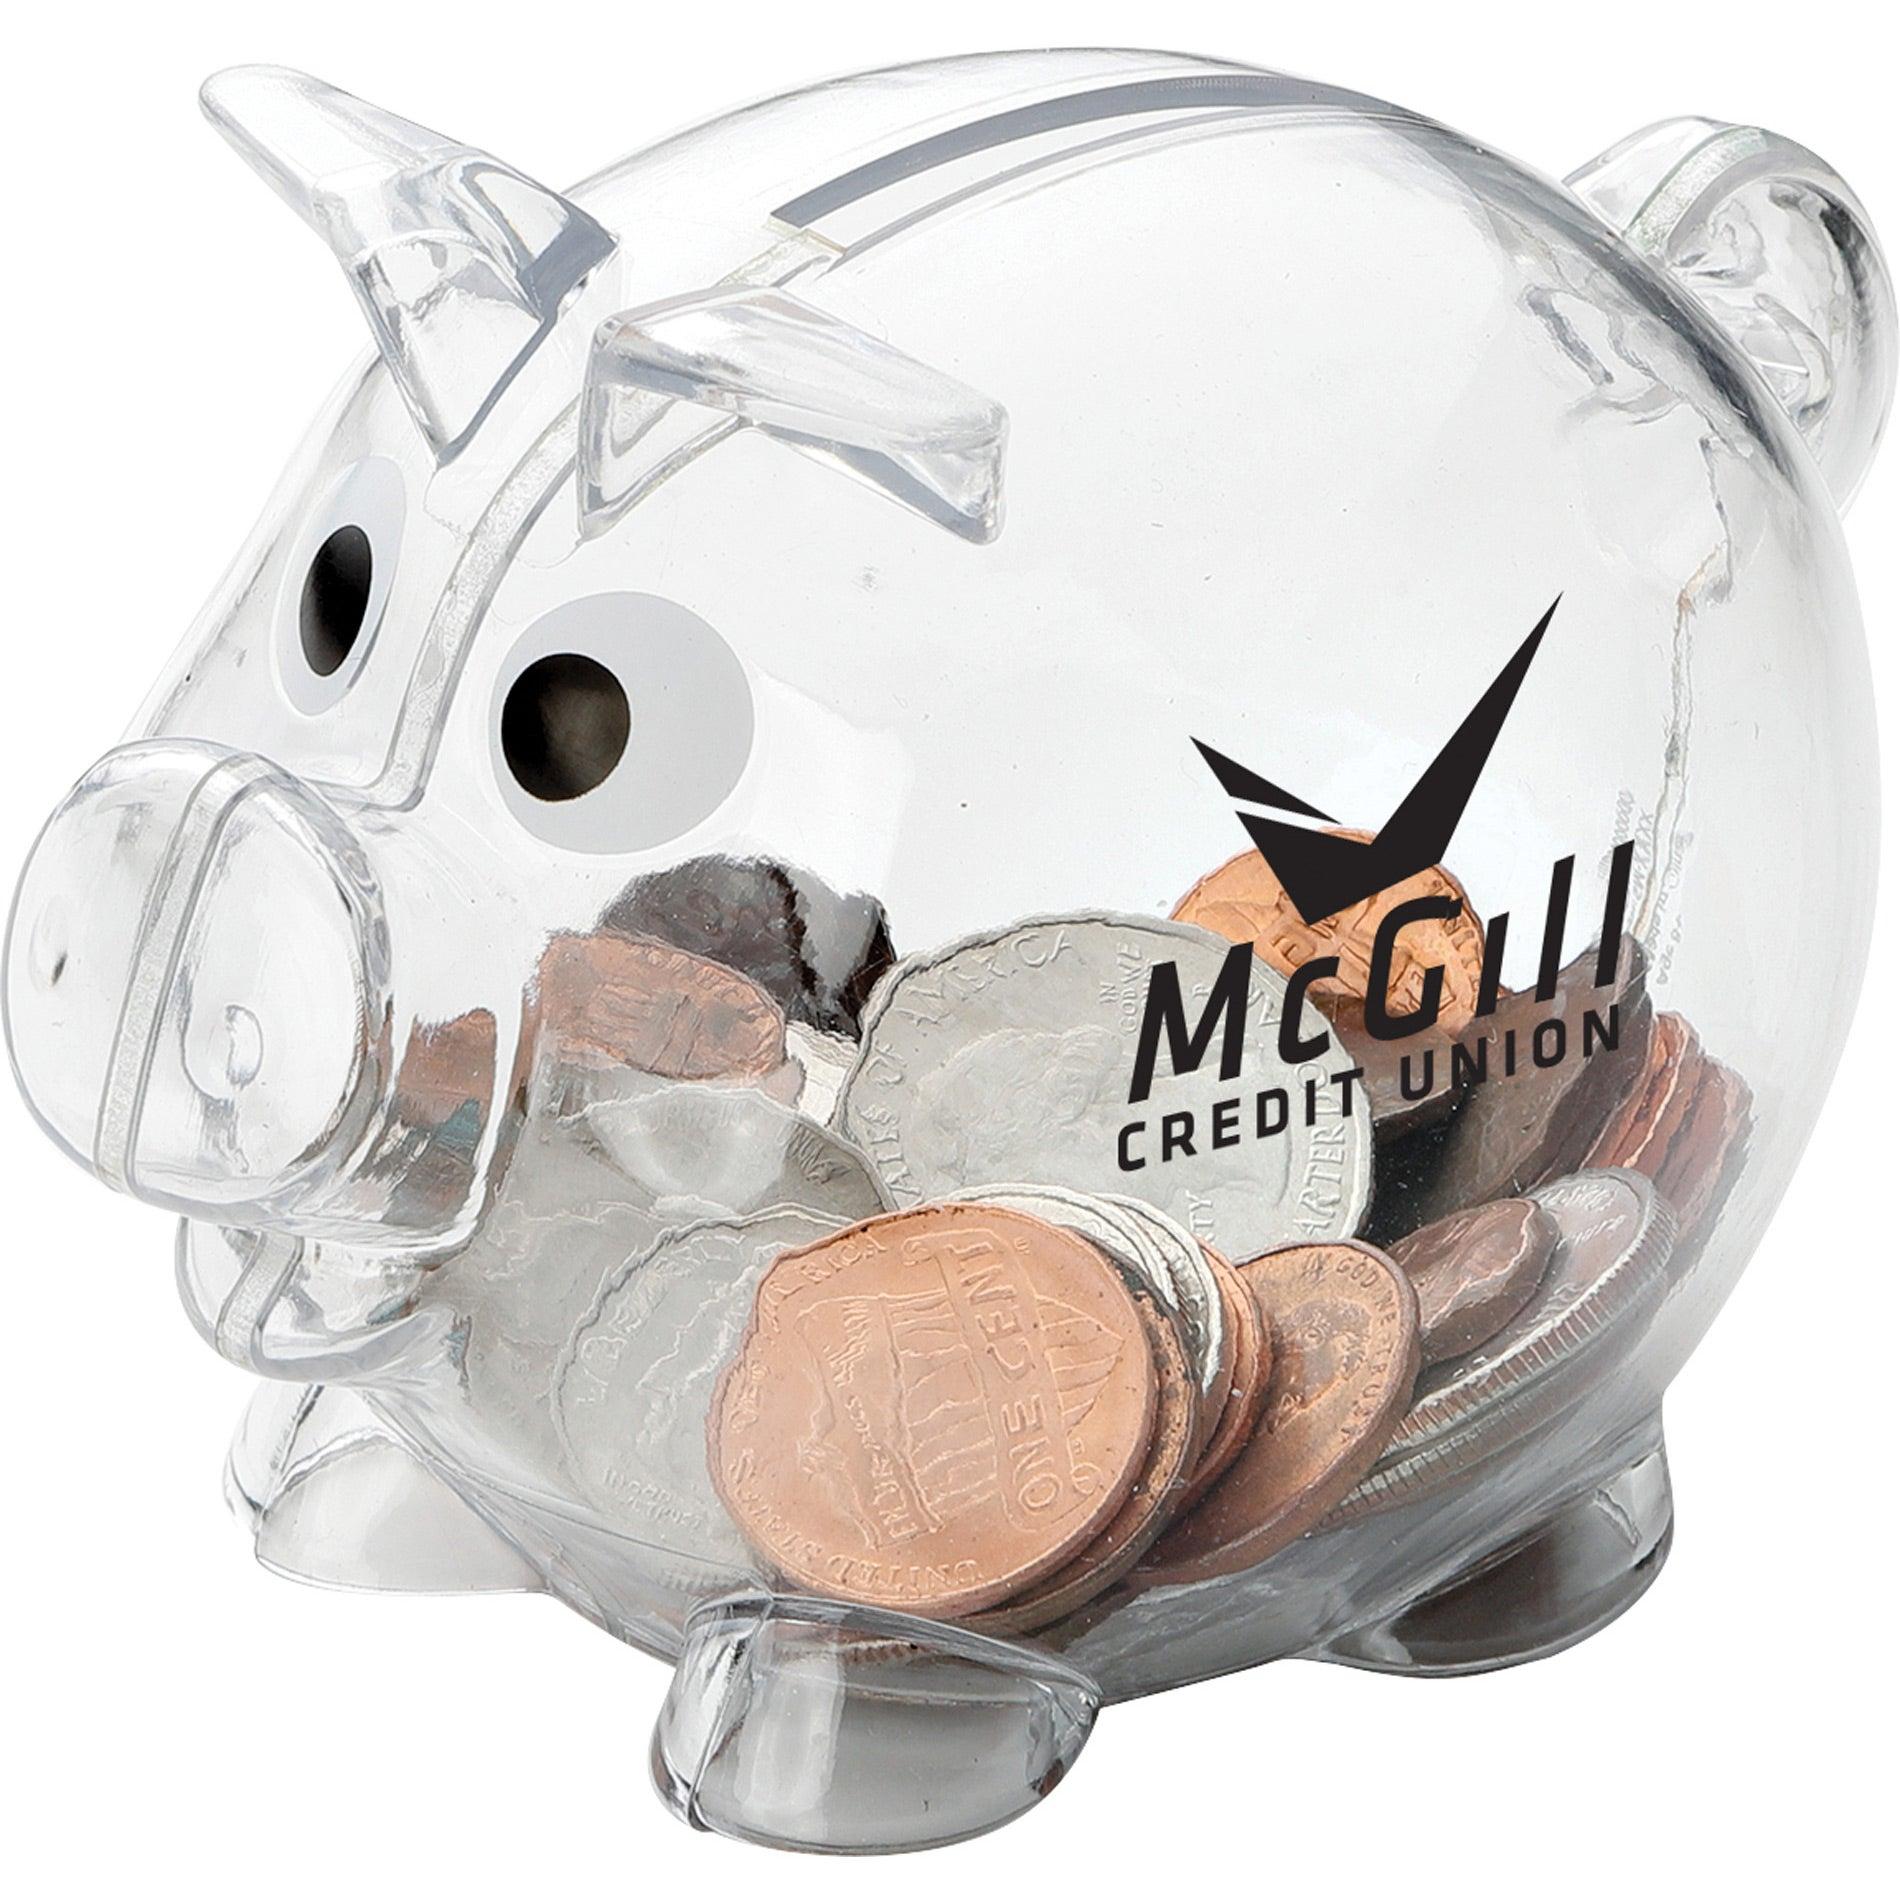 Design Bank Twist.Mini Twist Open Piggy Banks Personalized Coin Banks